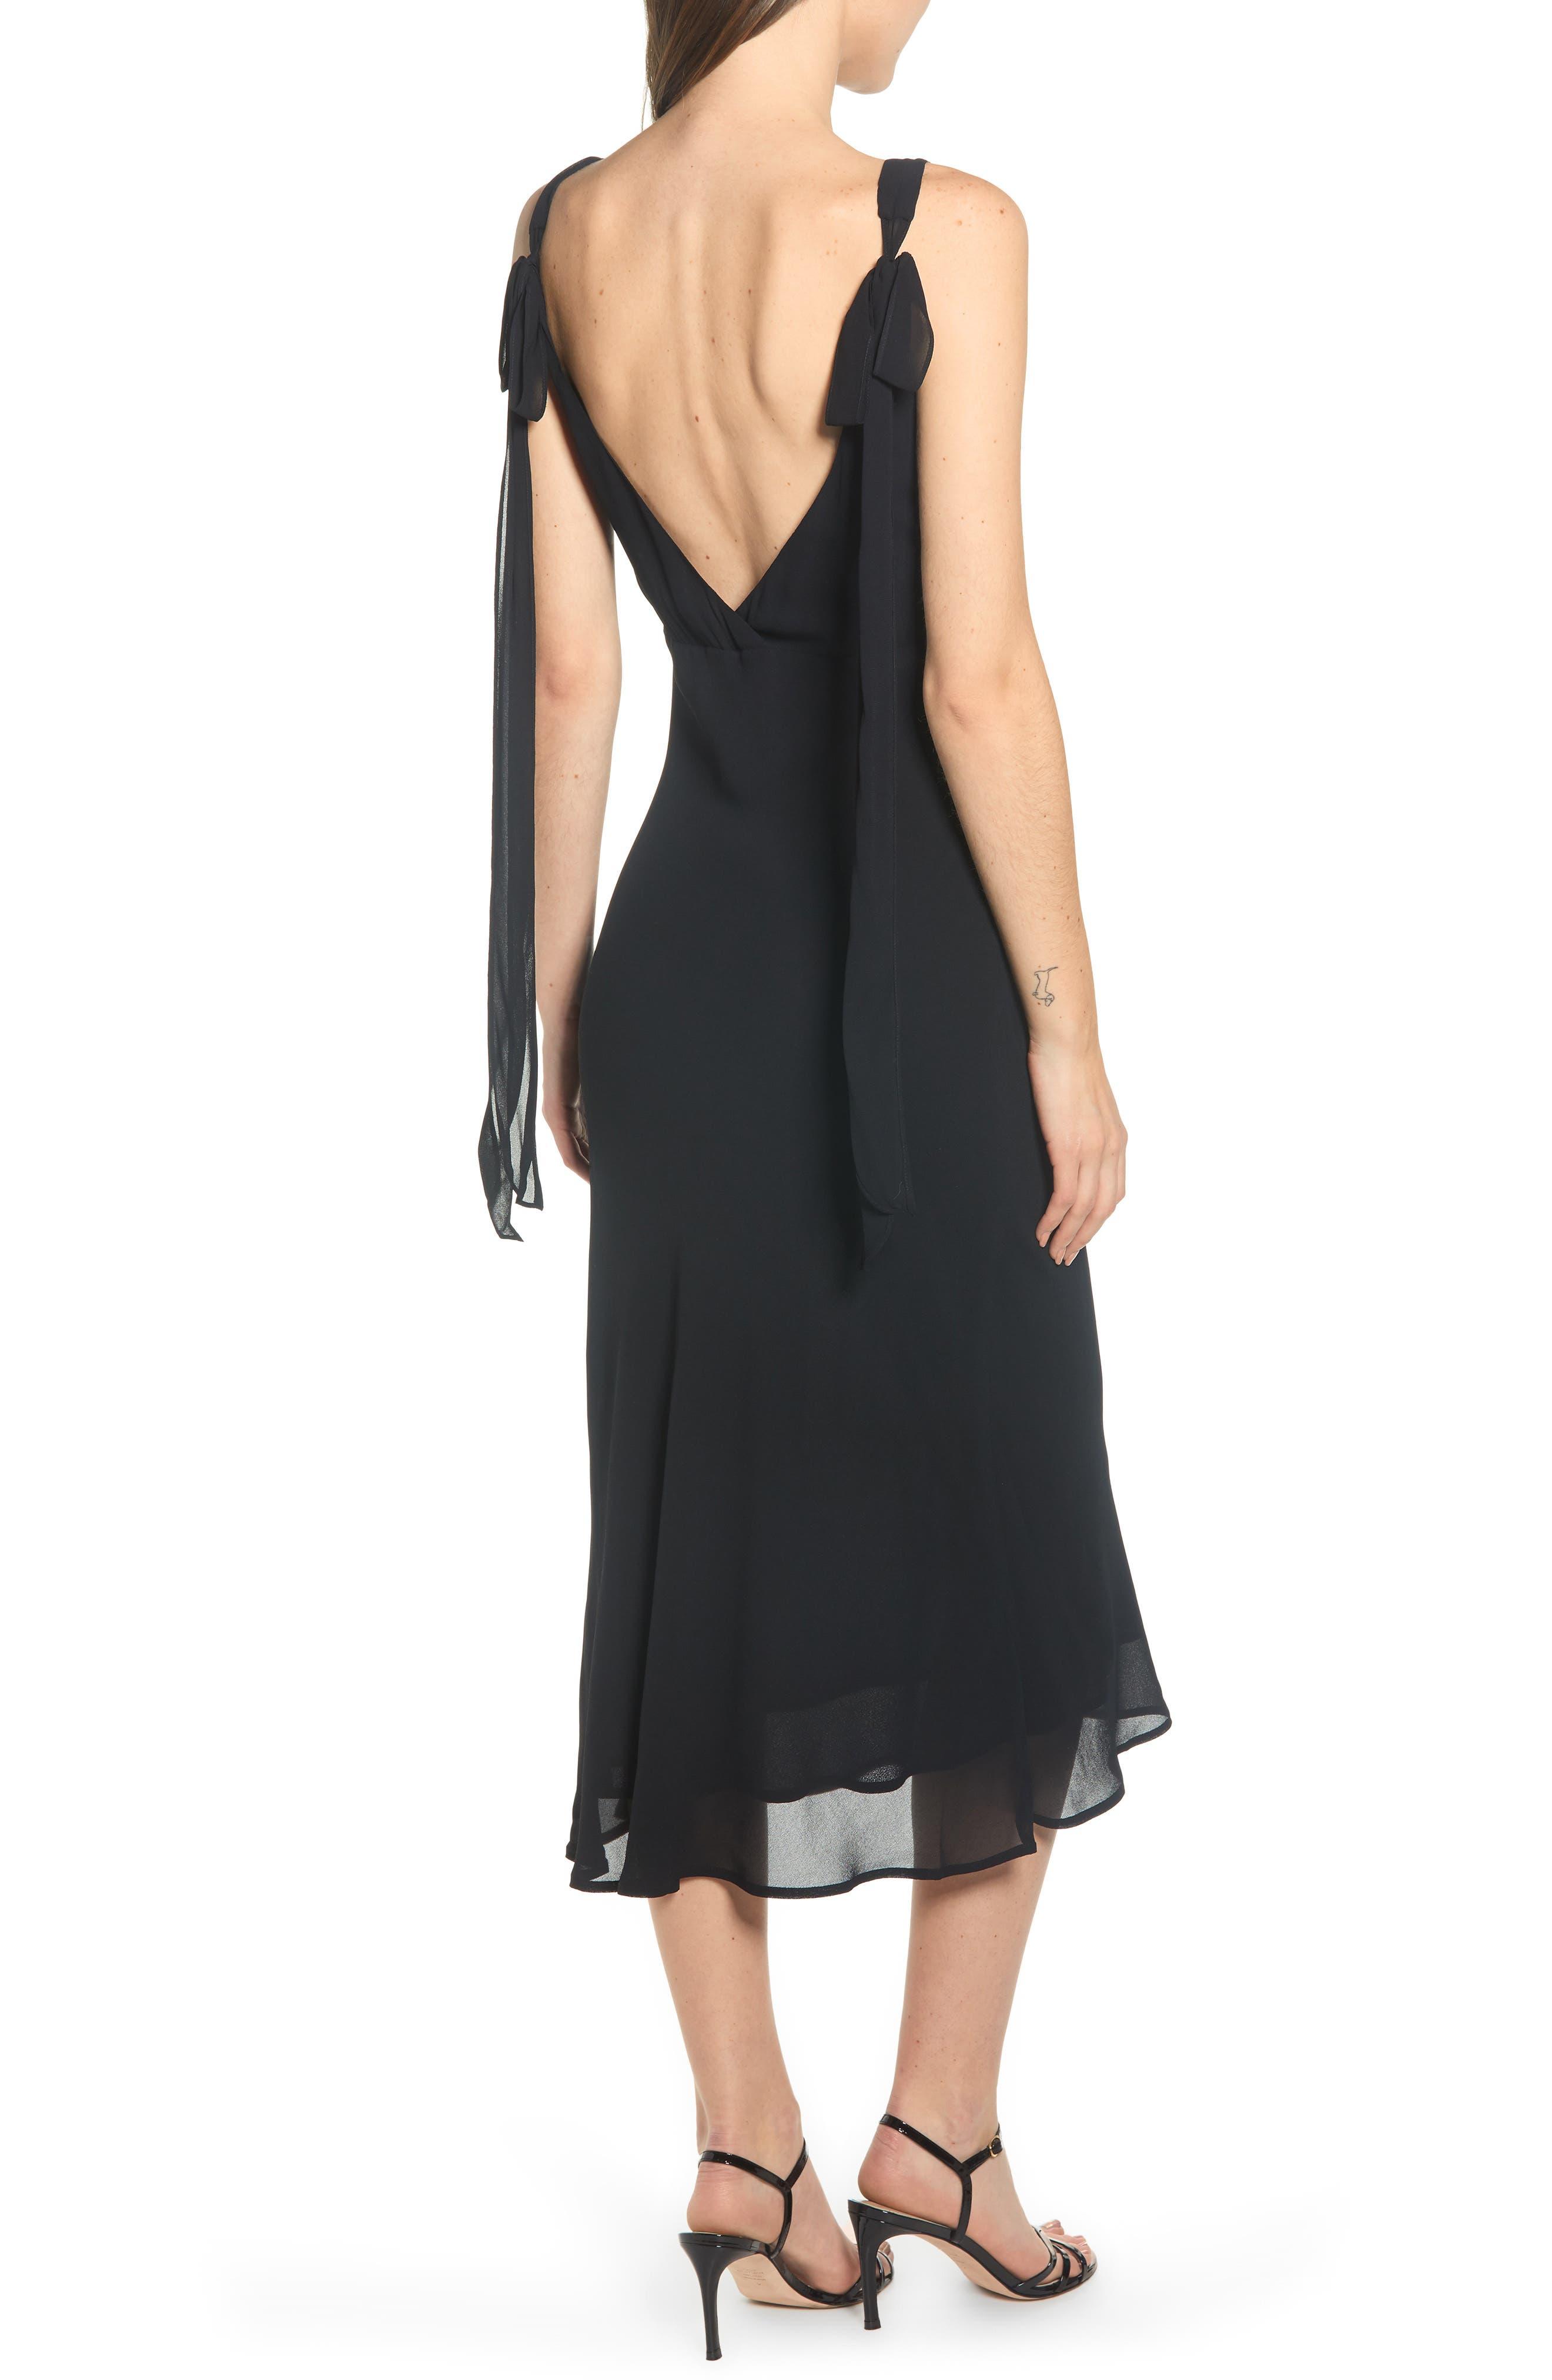 REFORMATION, Venezia Dress, Alternate thumbnail 2, color, BLACK